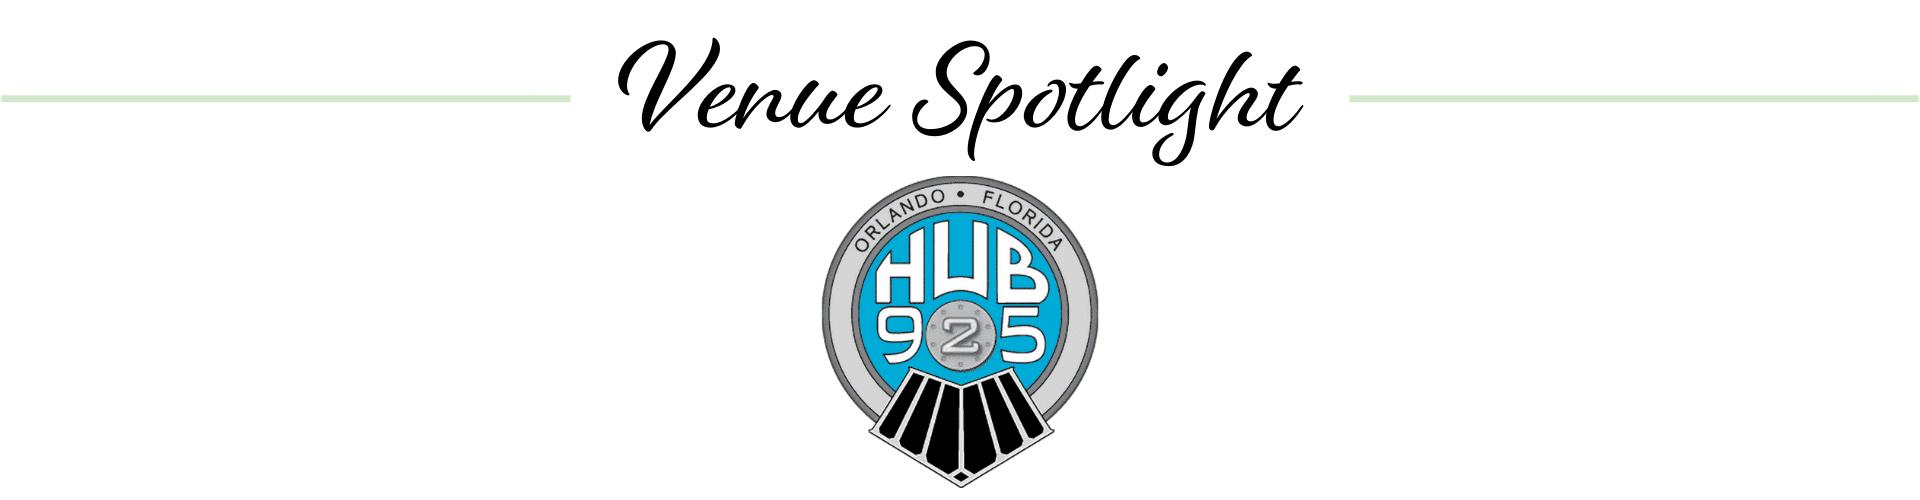 Hub 925 logo